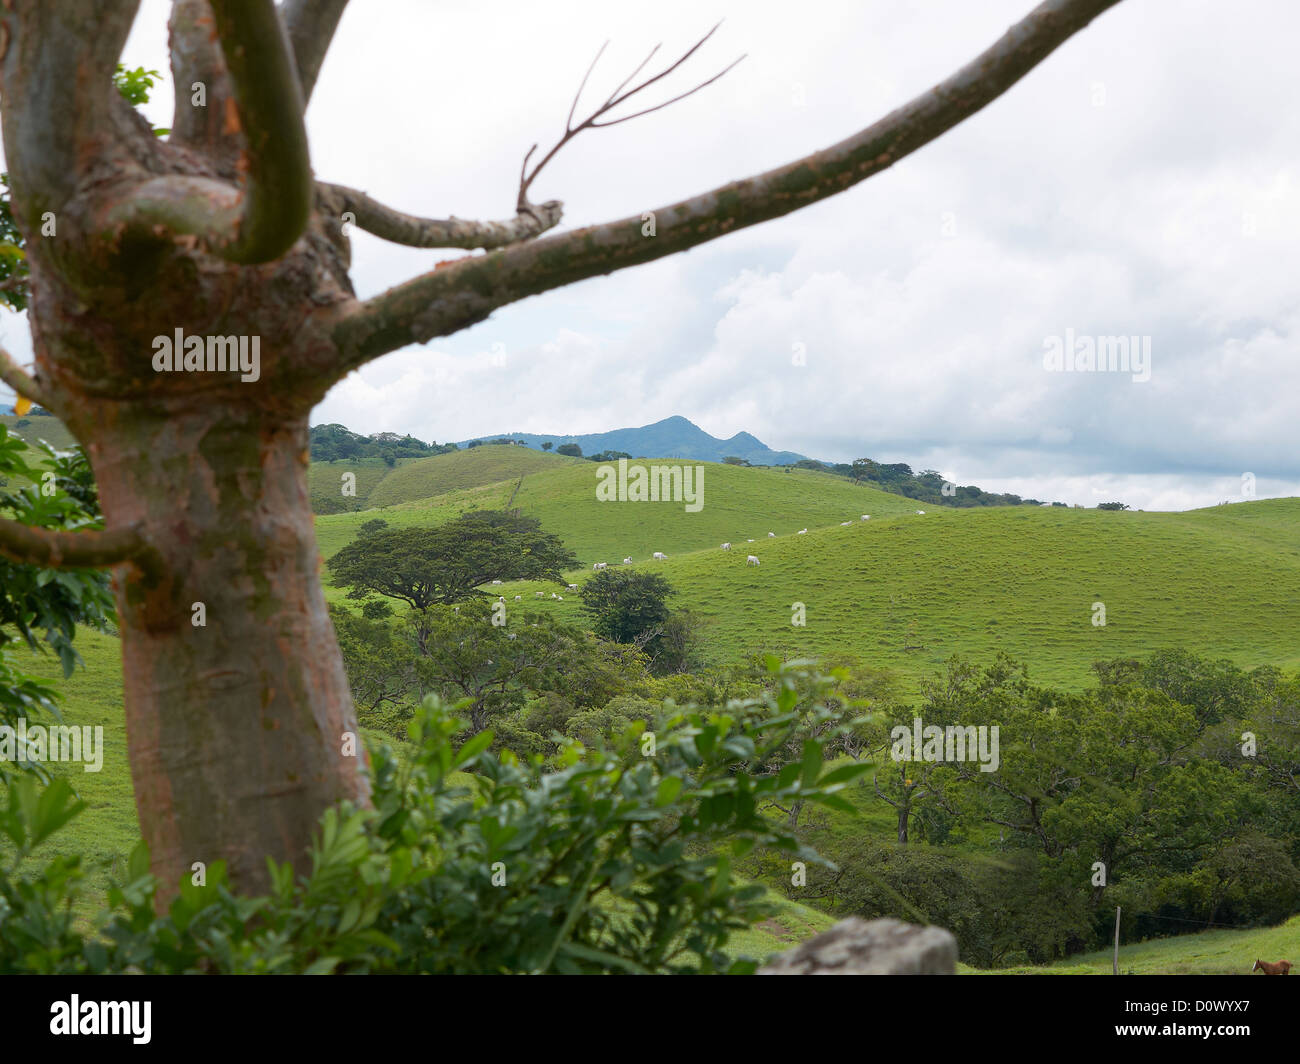 mist shrouded,green highland mountain forest; meteorolgical devide; near the mountainsides of Cordillera de Tilaràn,Costa - Stock Image